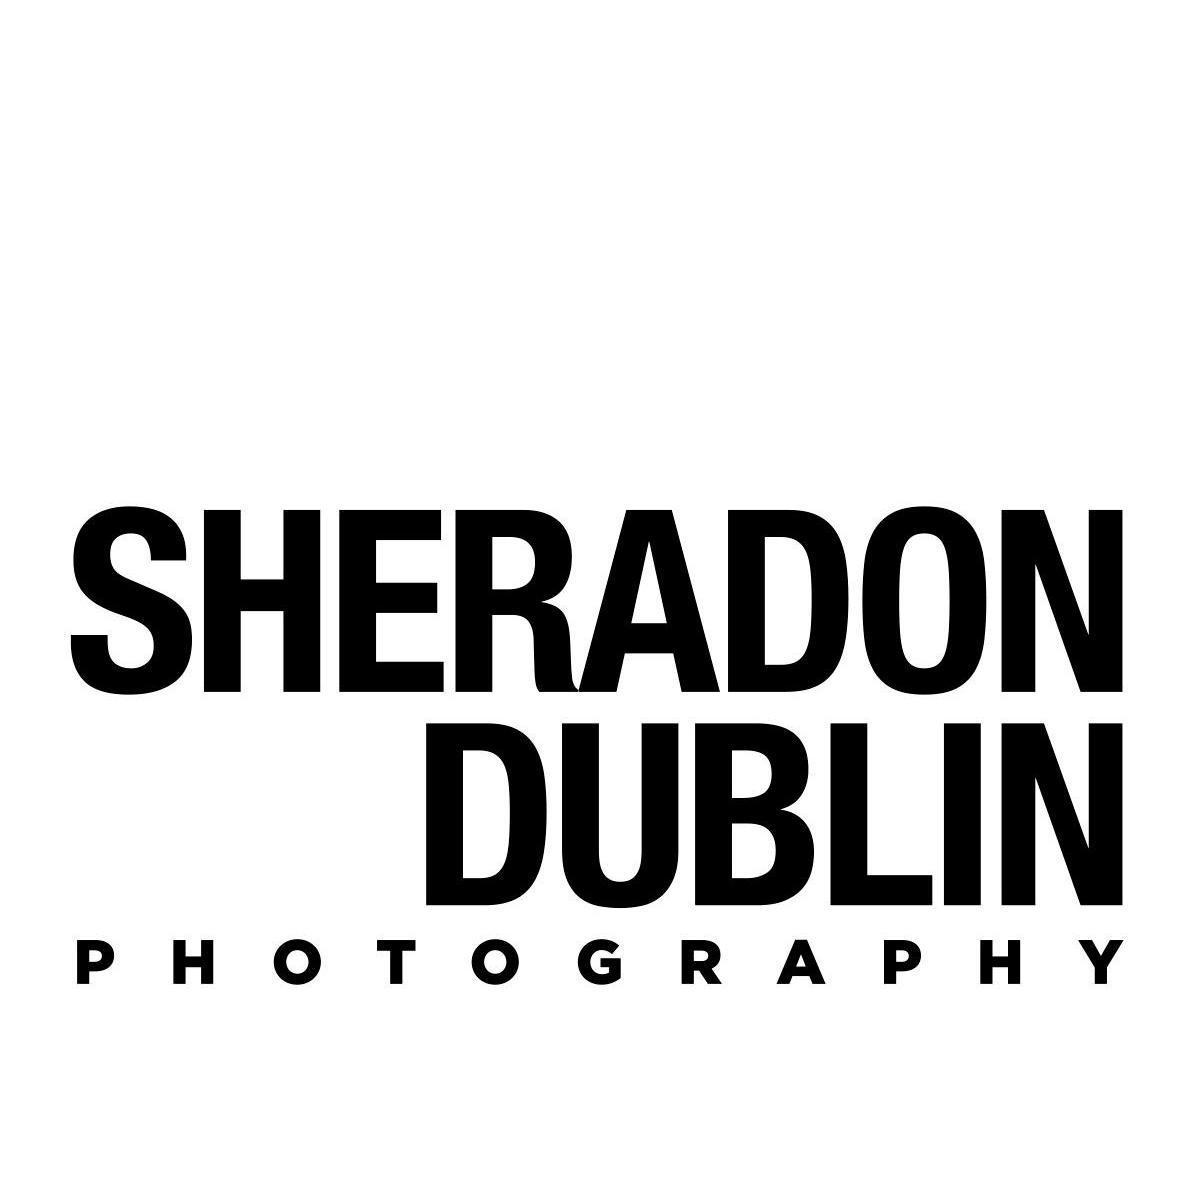 Sheradon Dublin Photography - Margate, Kent CT9 1EE - 07931 373409 | ShowMeLocal.com